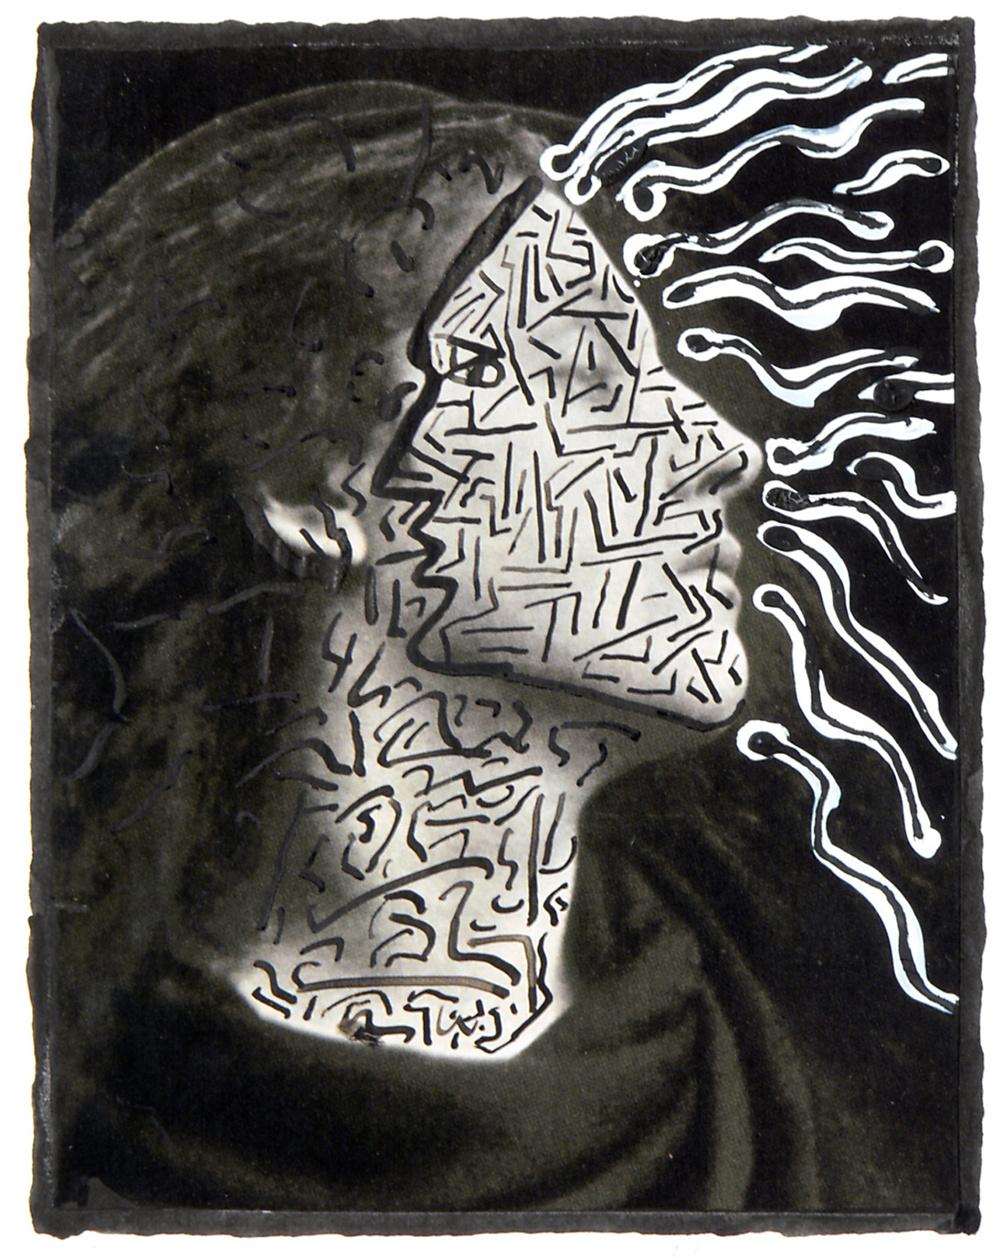 Derek Boshier, Dreaming Sensuality, treated photograph, 2006